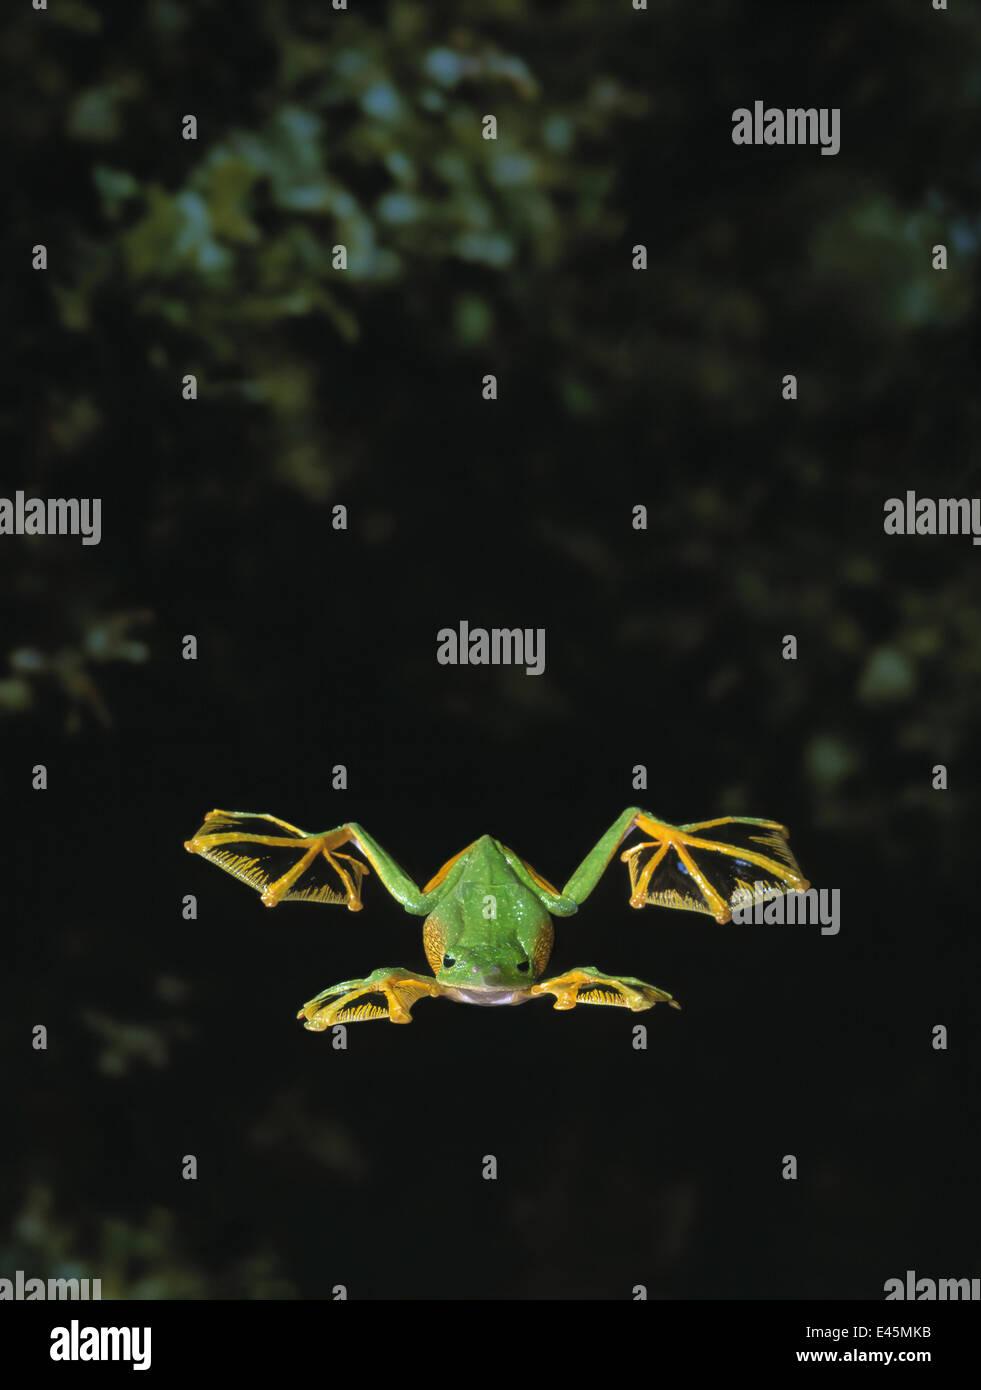 Wallace's / Abah river flying frog (Rhacophorus nigropalmatus) gliding, showing use of webbed feet - Stock Image